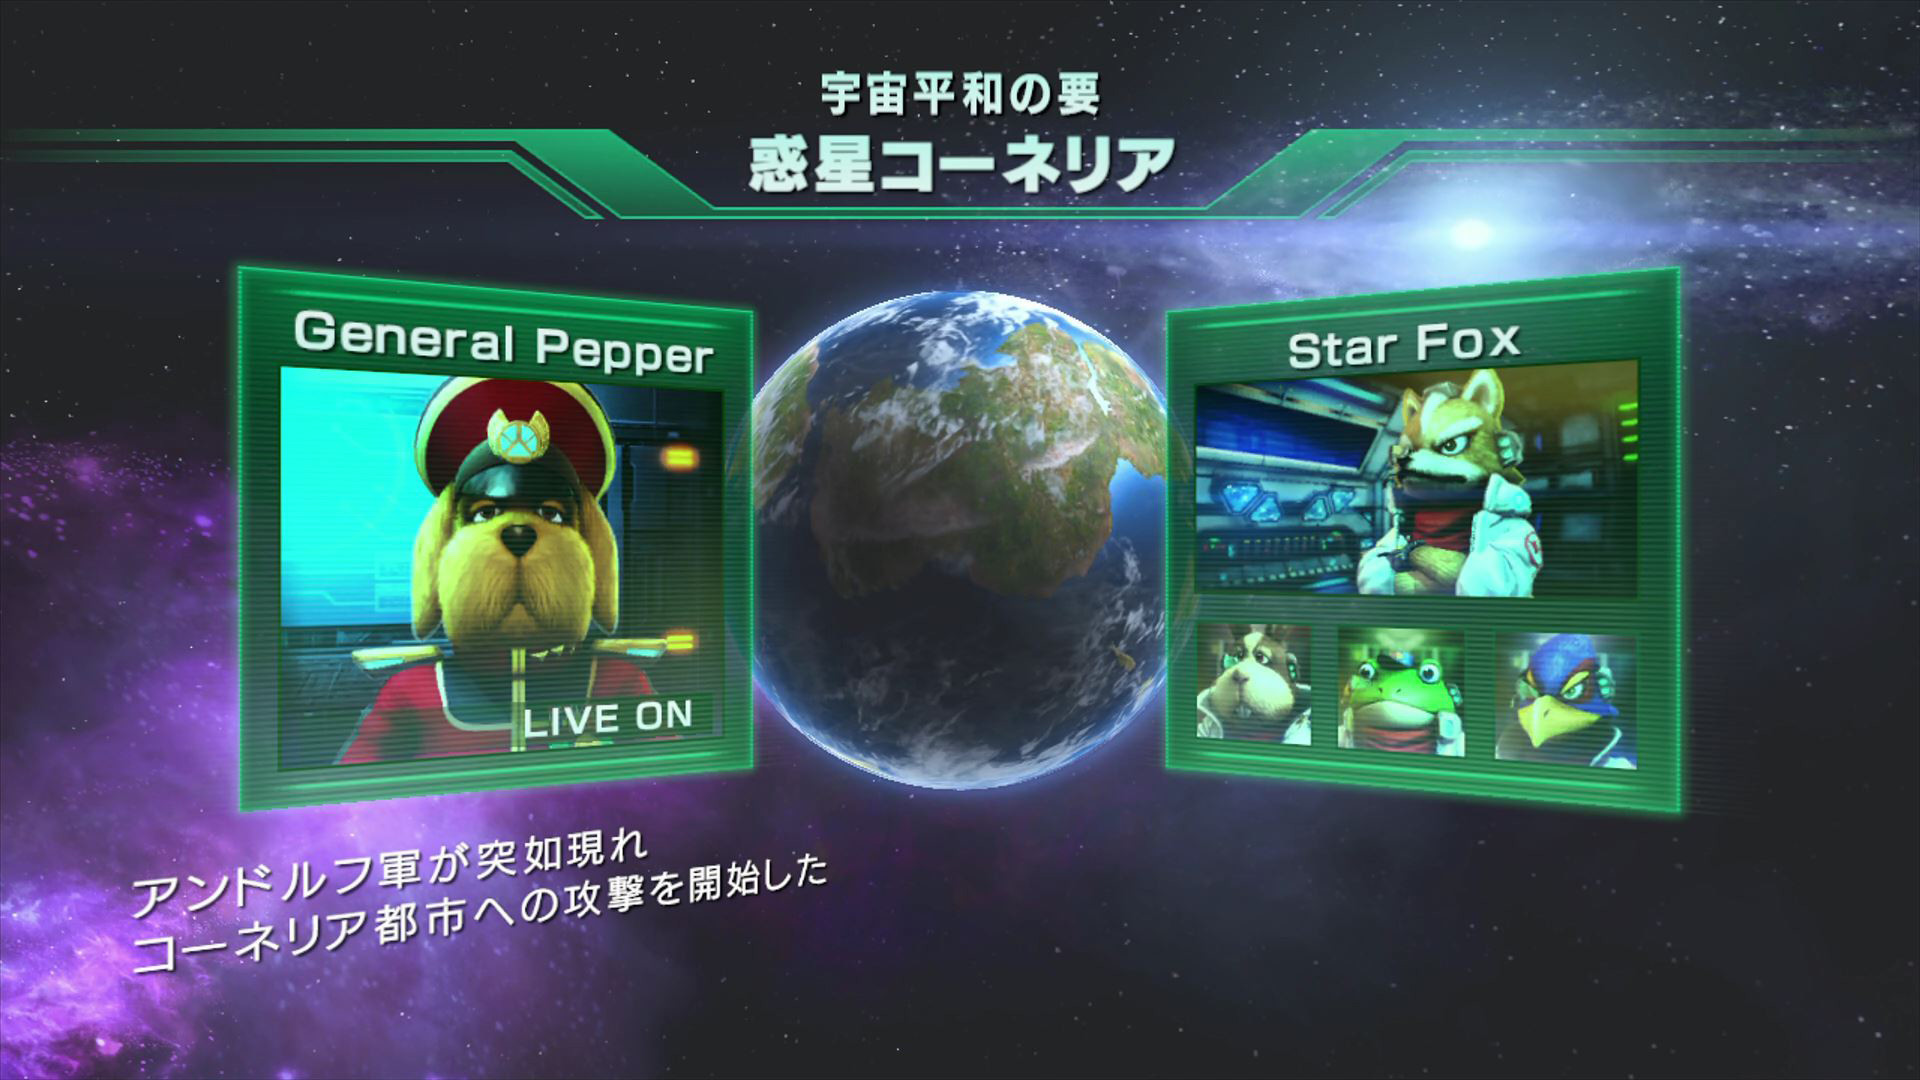 Star Fox Zero (Wii U) and Star Fox Guard (Wii U eShop) are now available  worldwide.